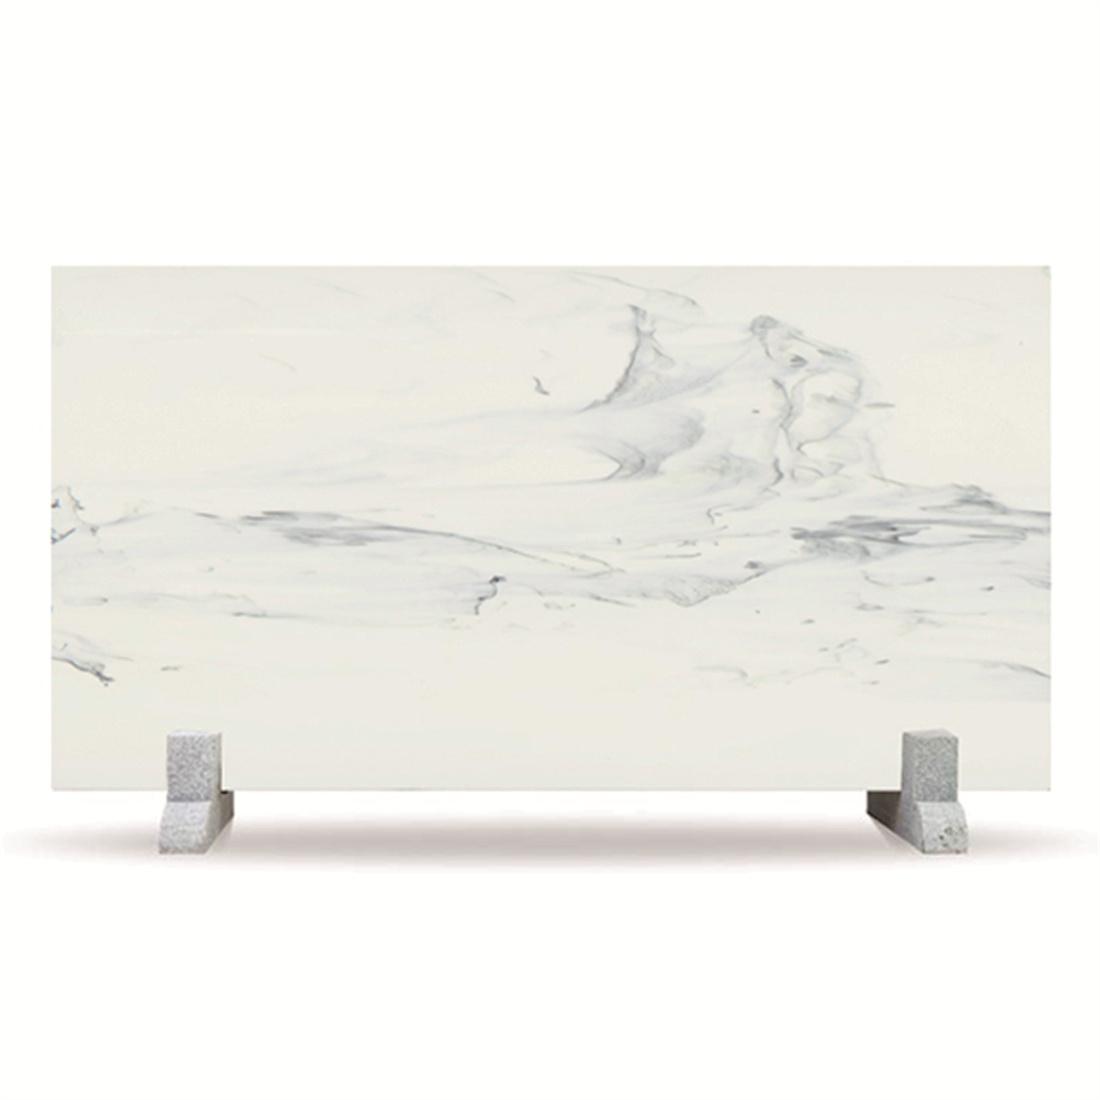 Kartso Calacatta  Nano Crystallized Glass Stone Slab For countertop or hotel wall panel